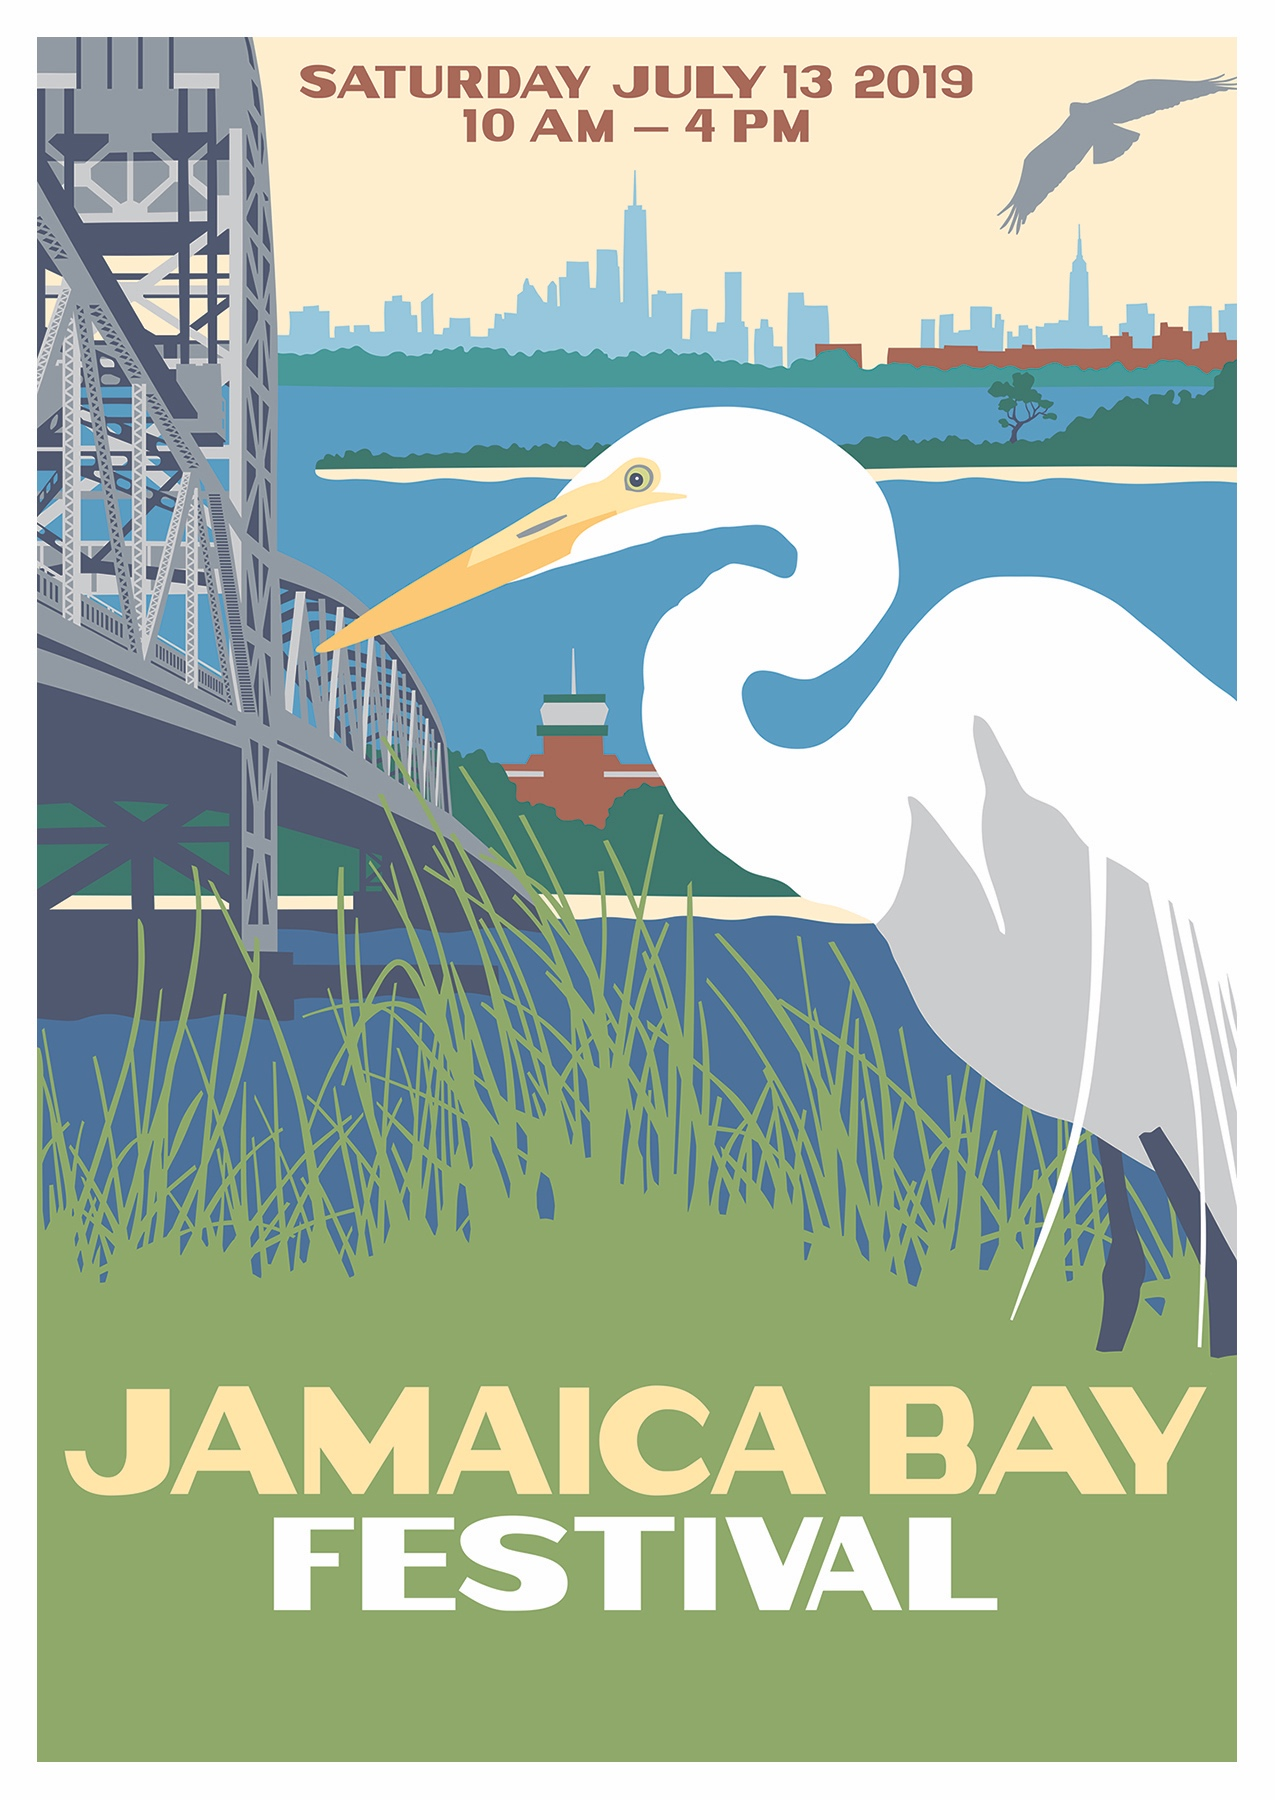 jamaica-bay-festival-postcard.jpg